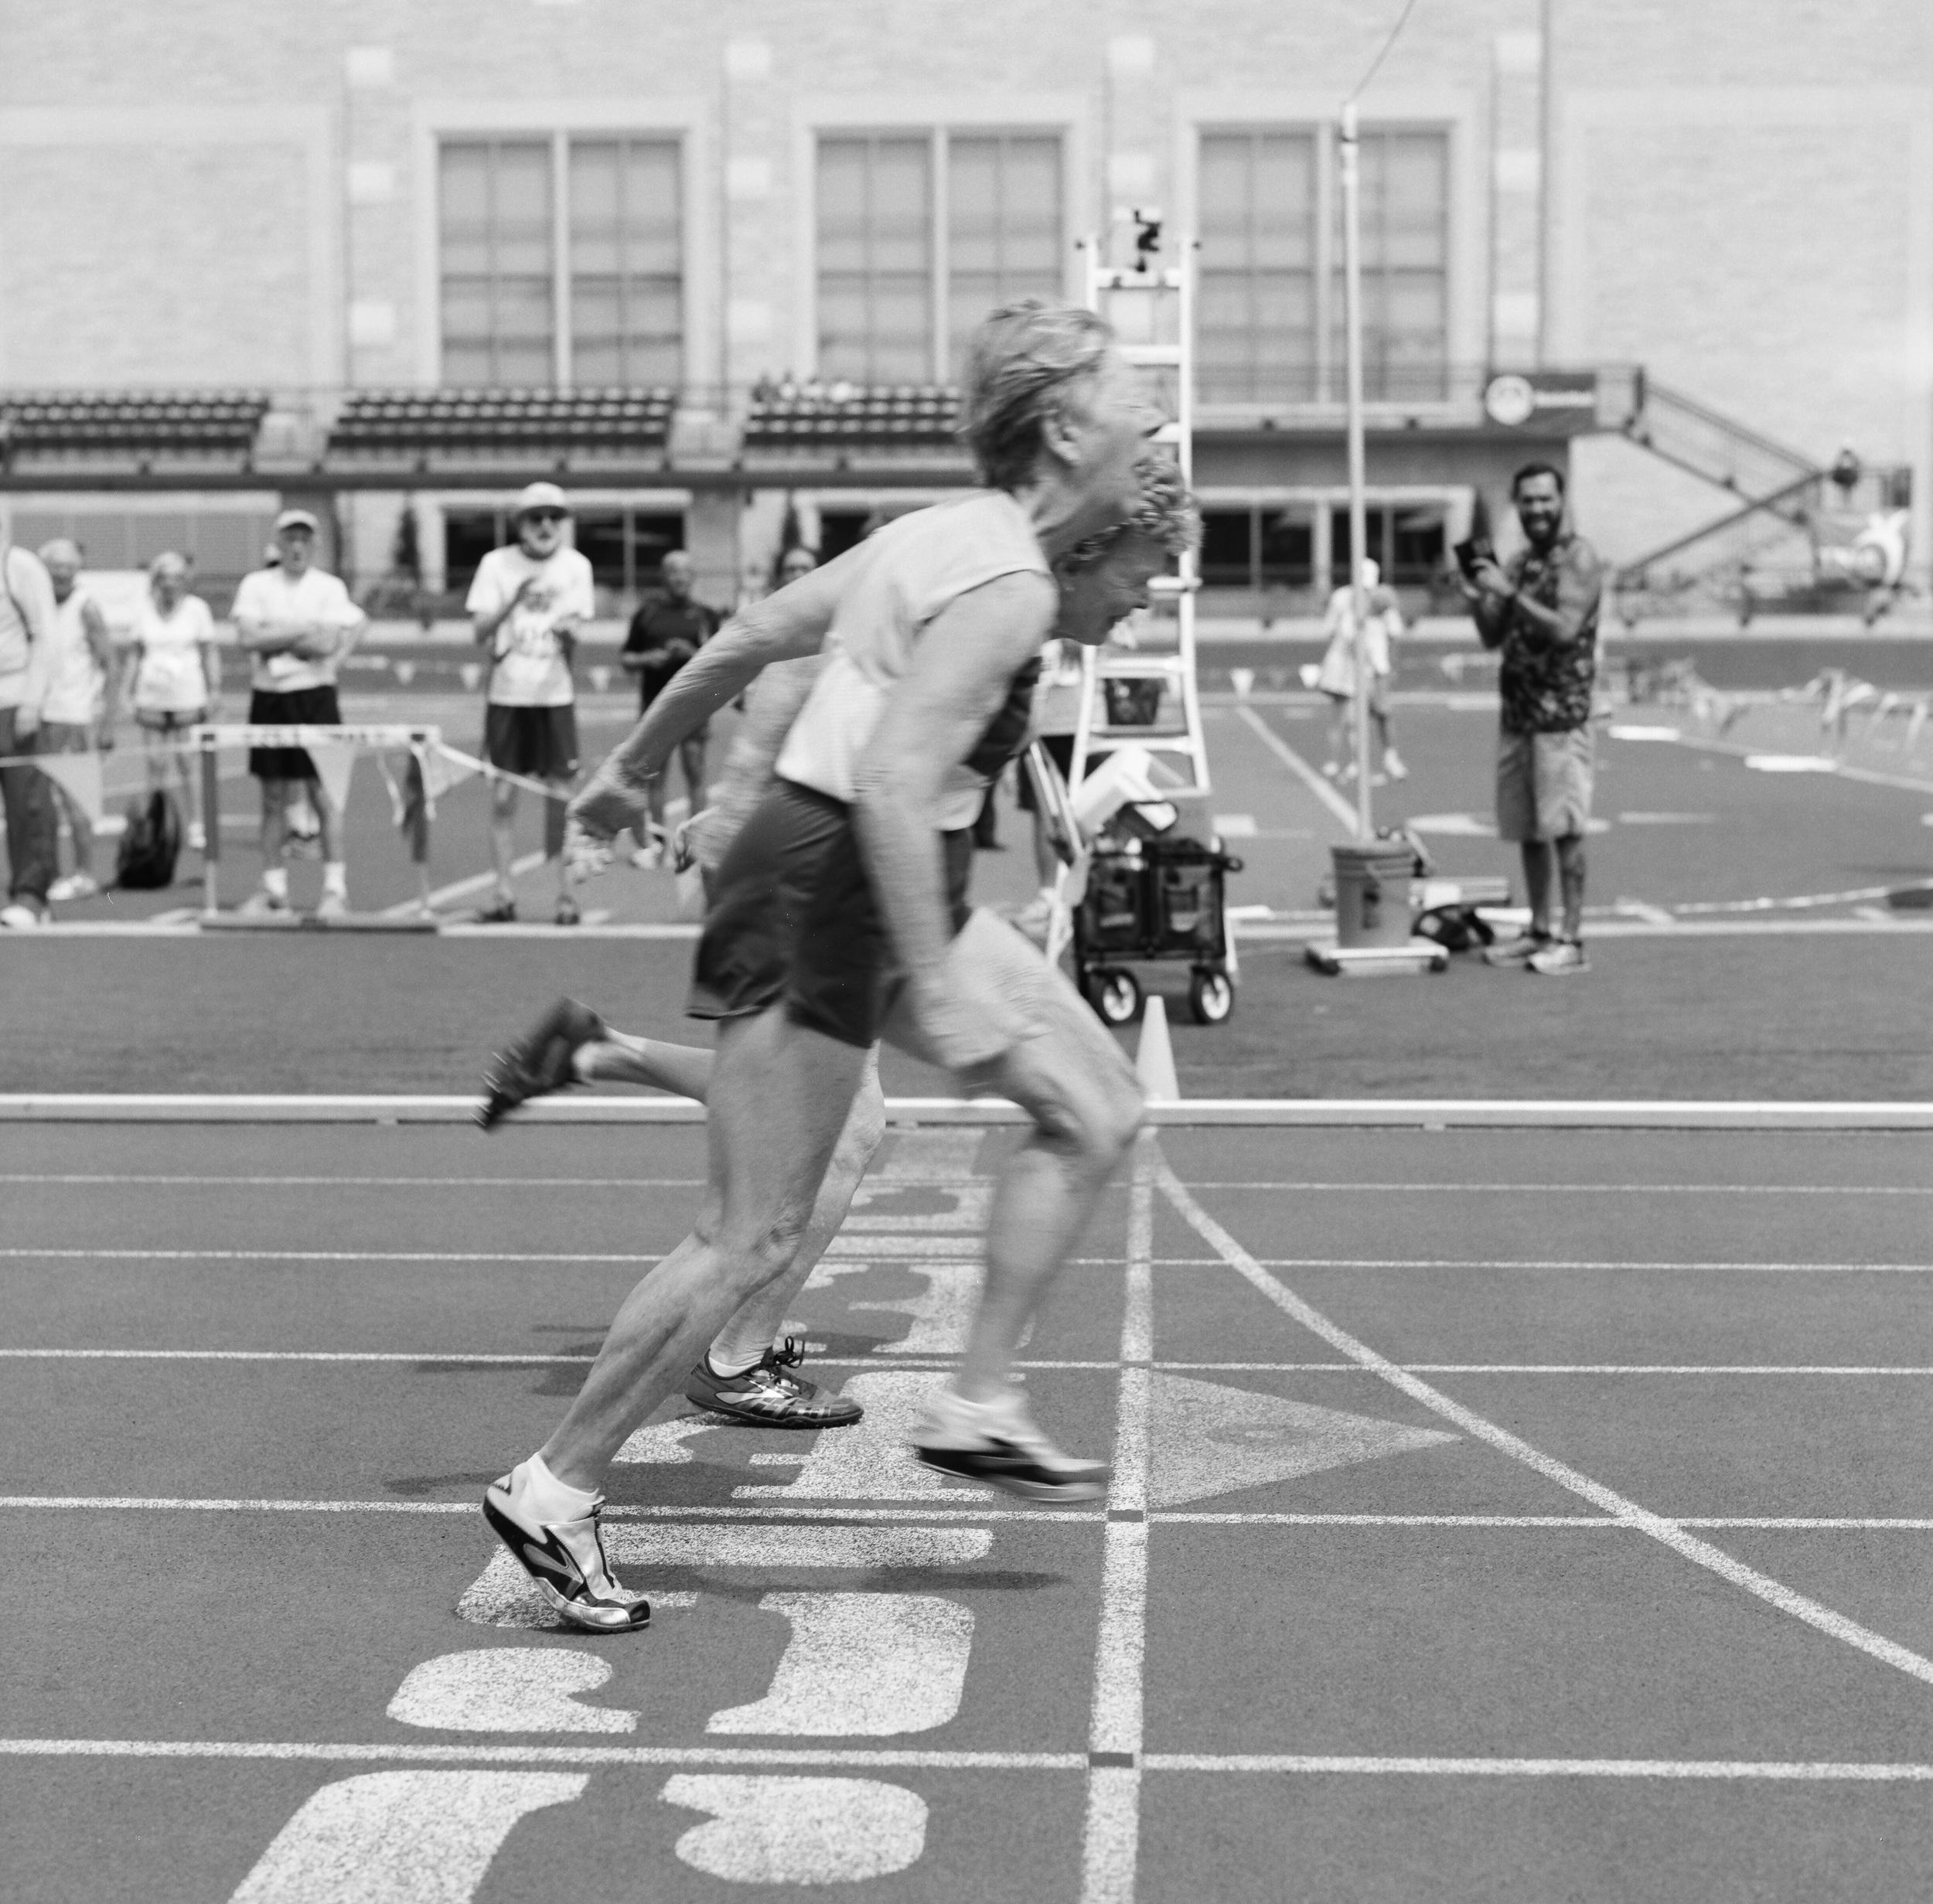 Flo & Barbara. Women's 80-84 100 meter finish line. National Senior Games. Minneapolis, 2015.